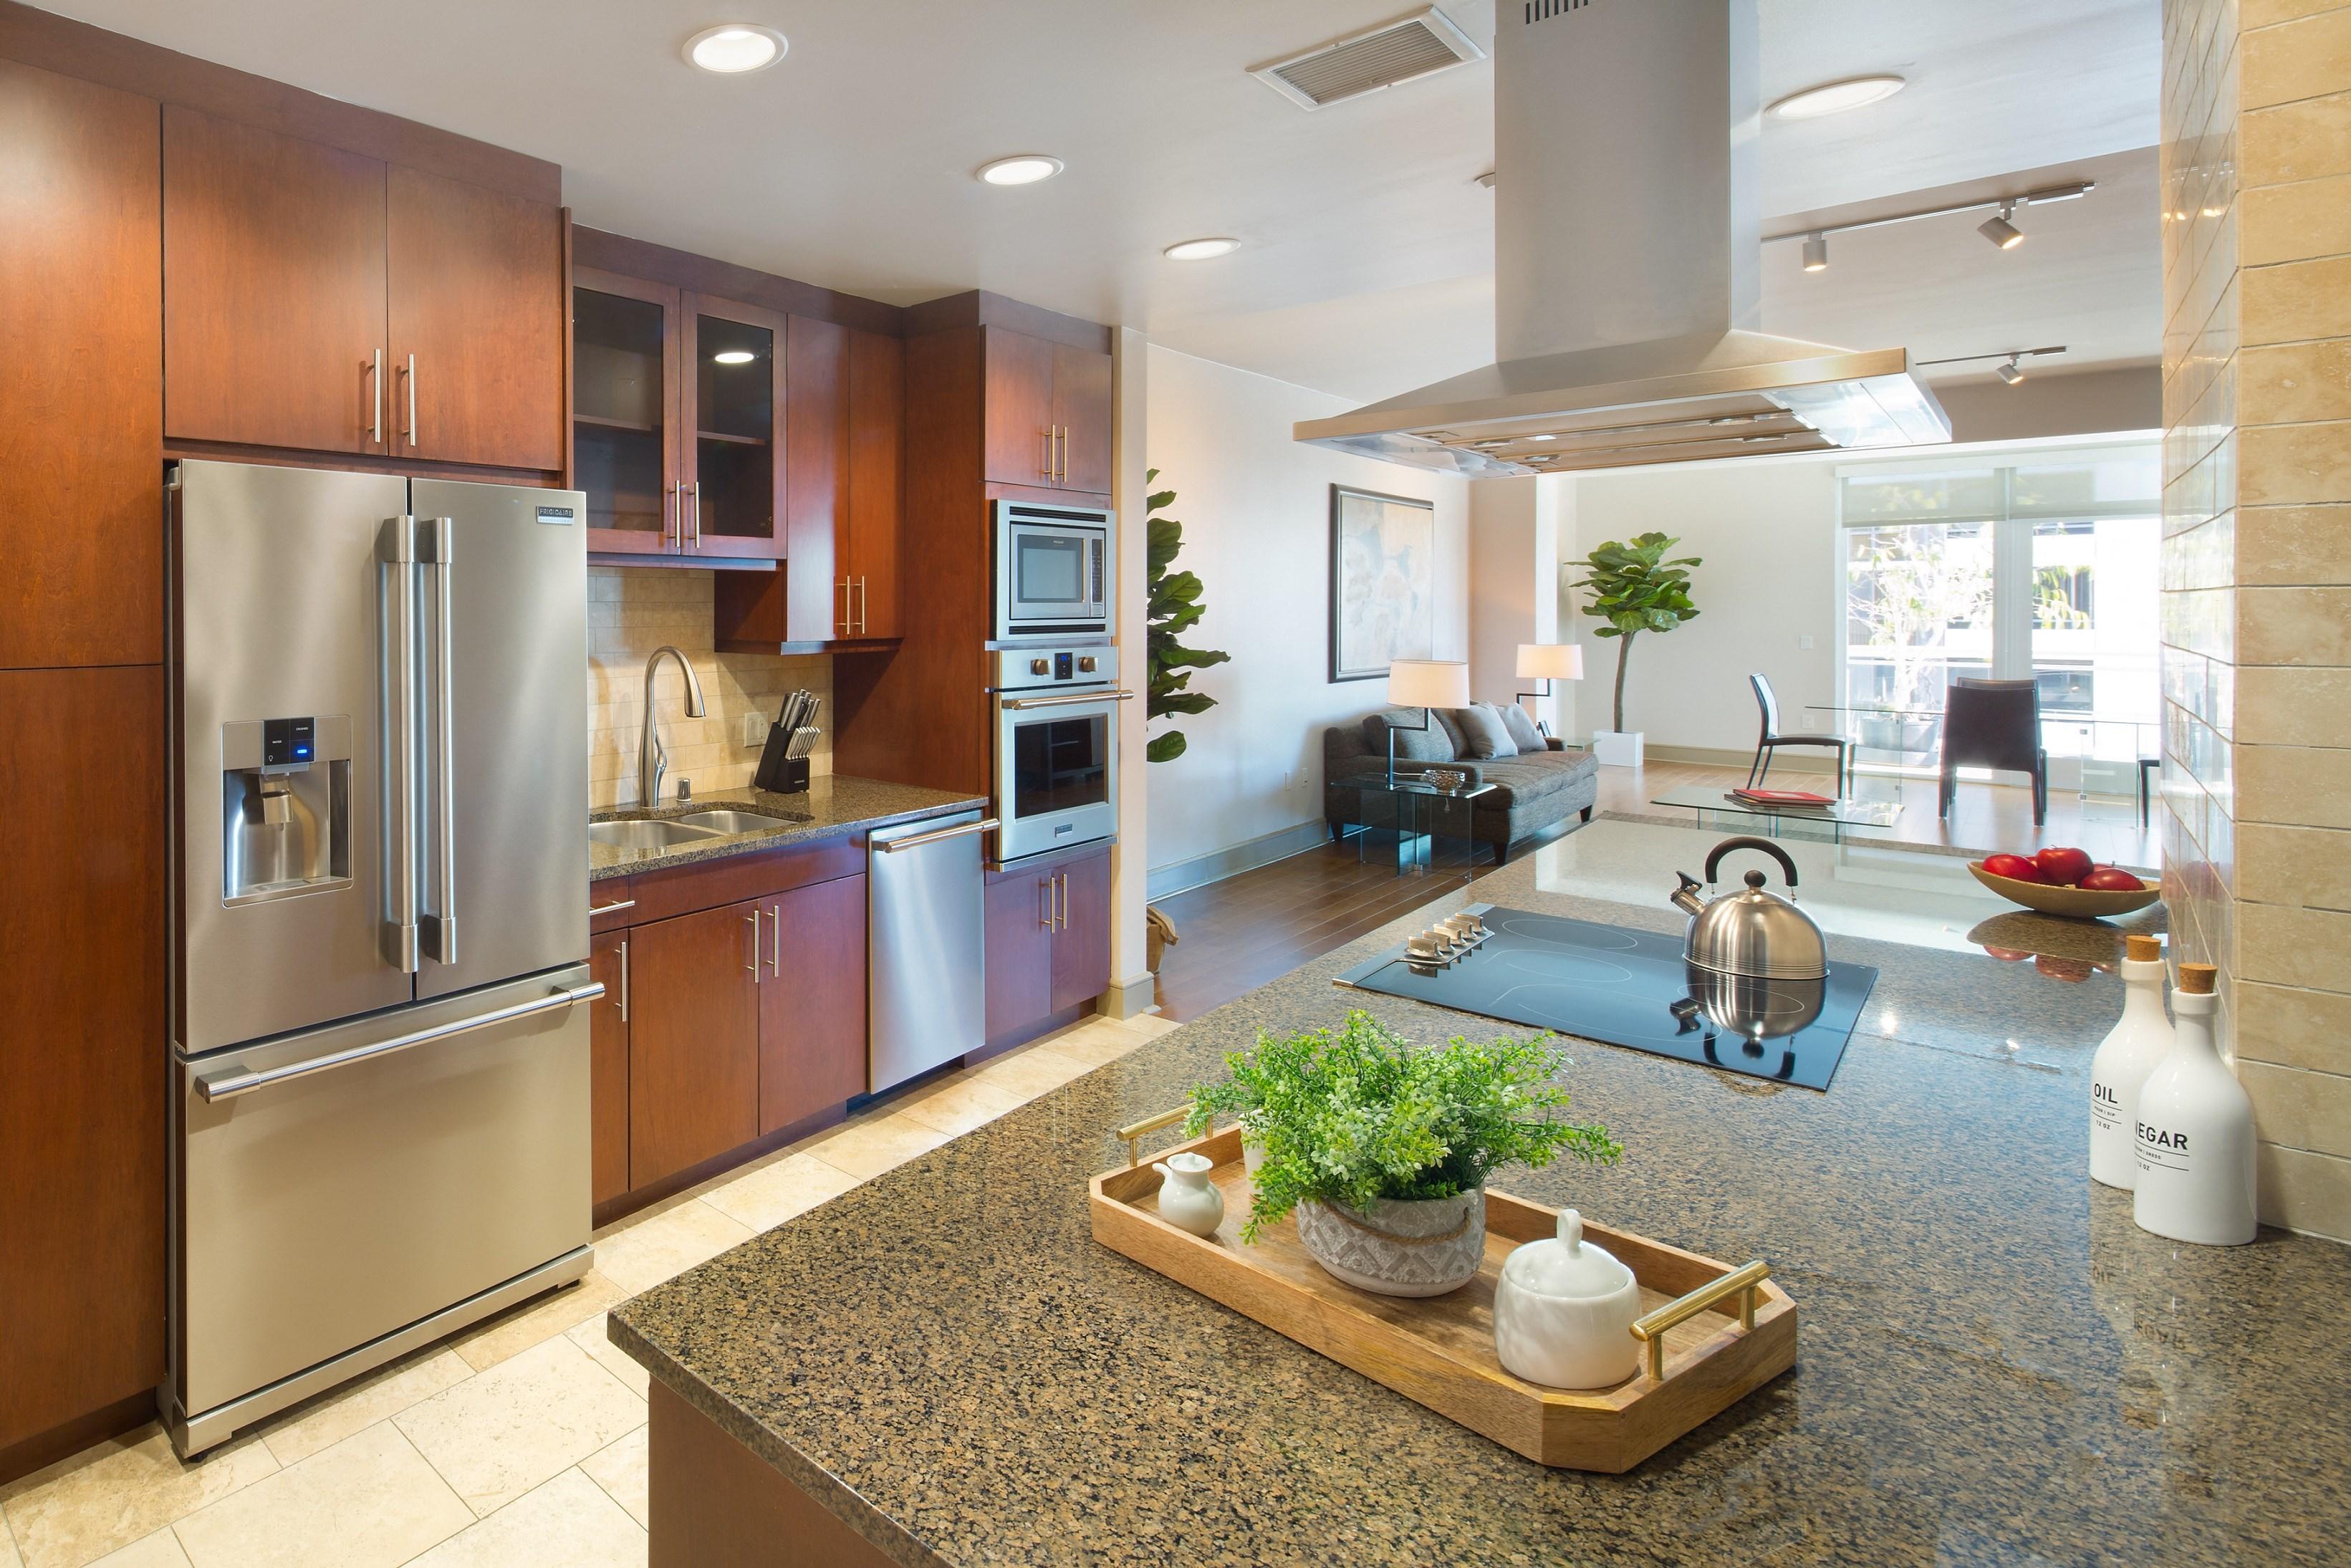 Westwood-Apartment-Wilshire-Victoria-Interior-Kitchen-6